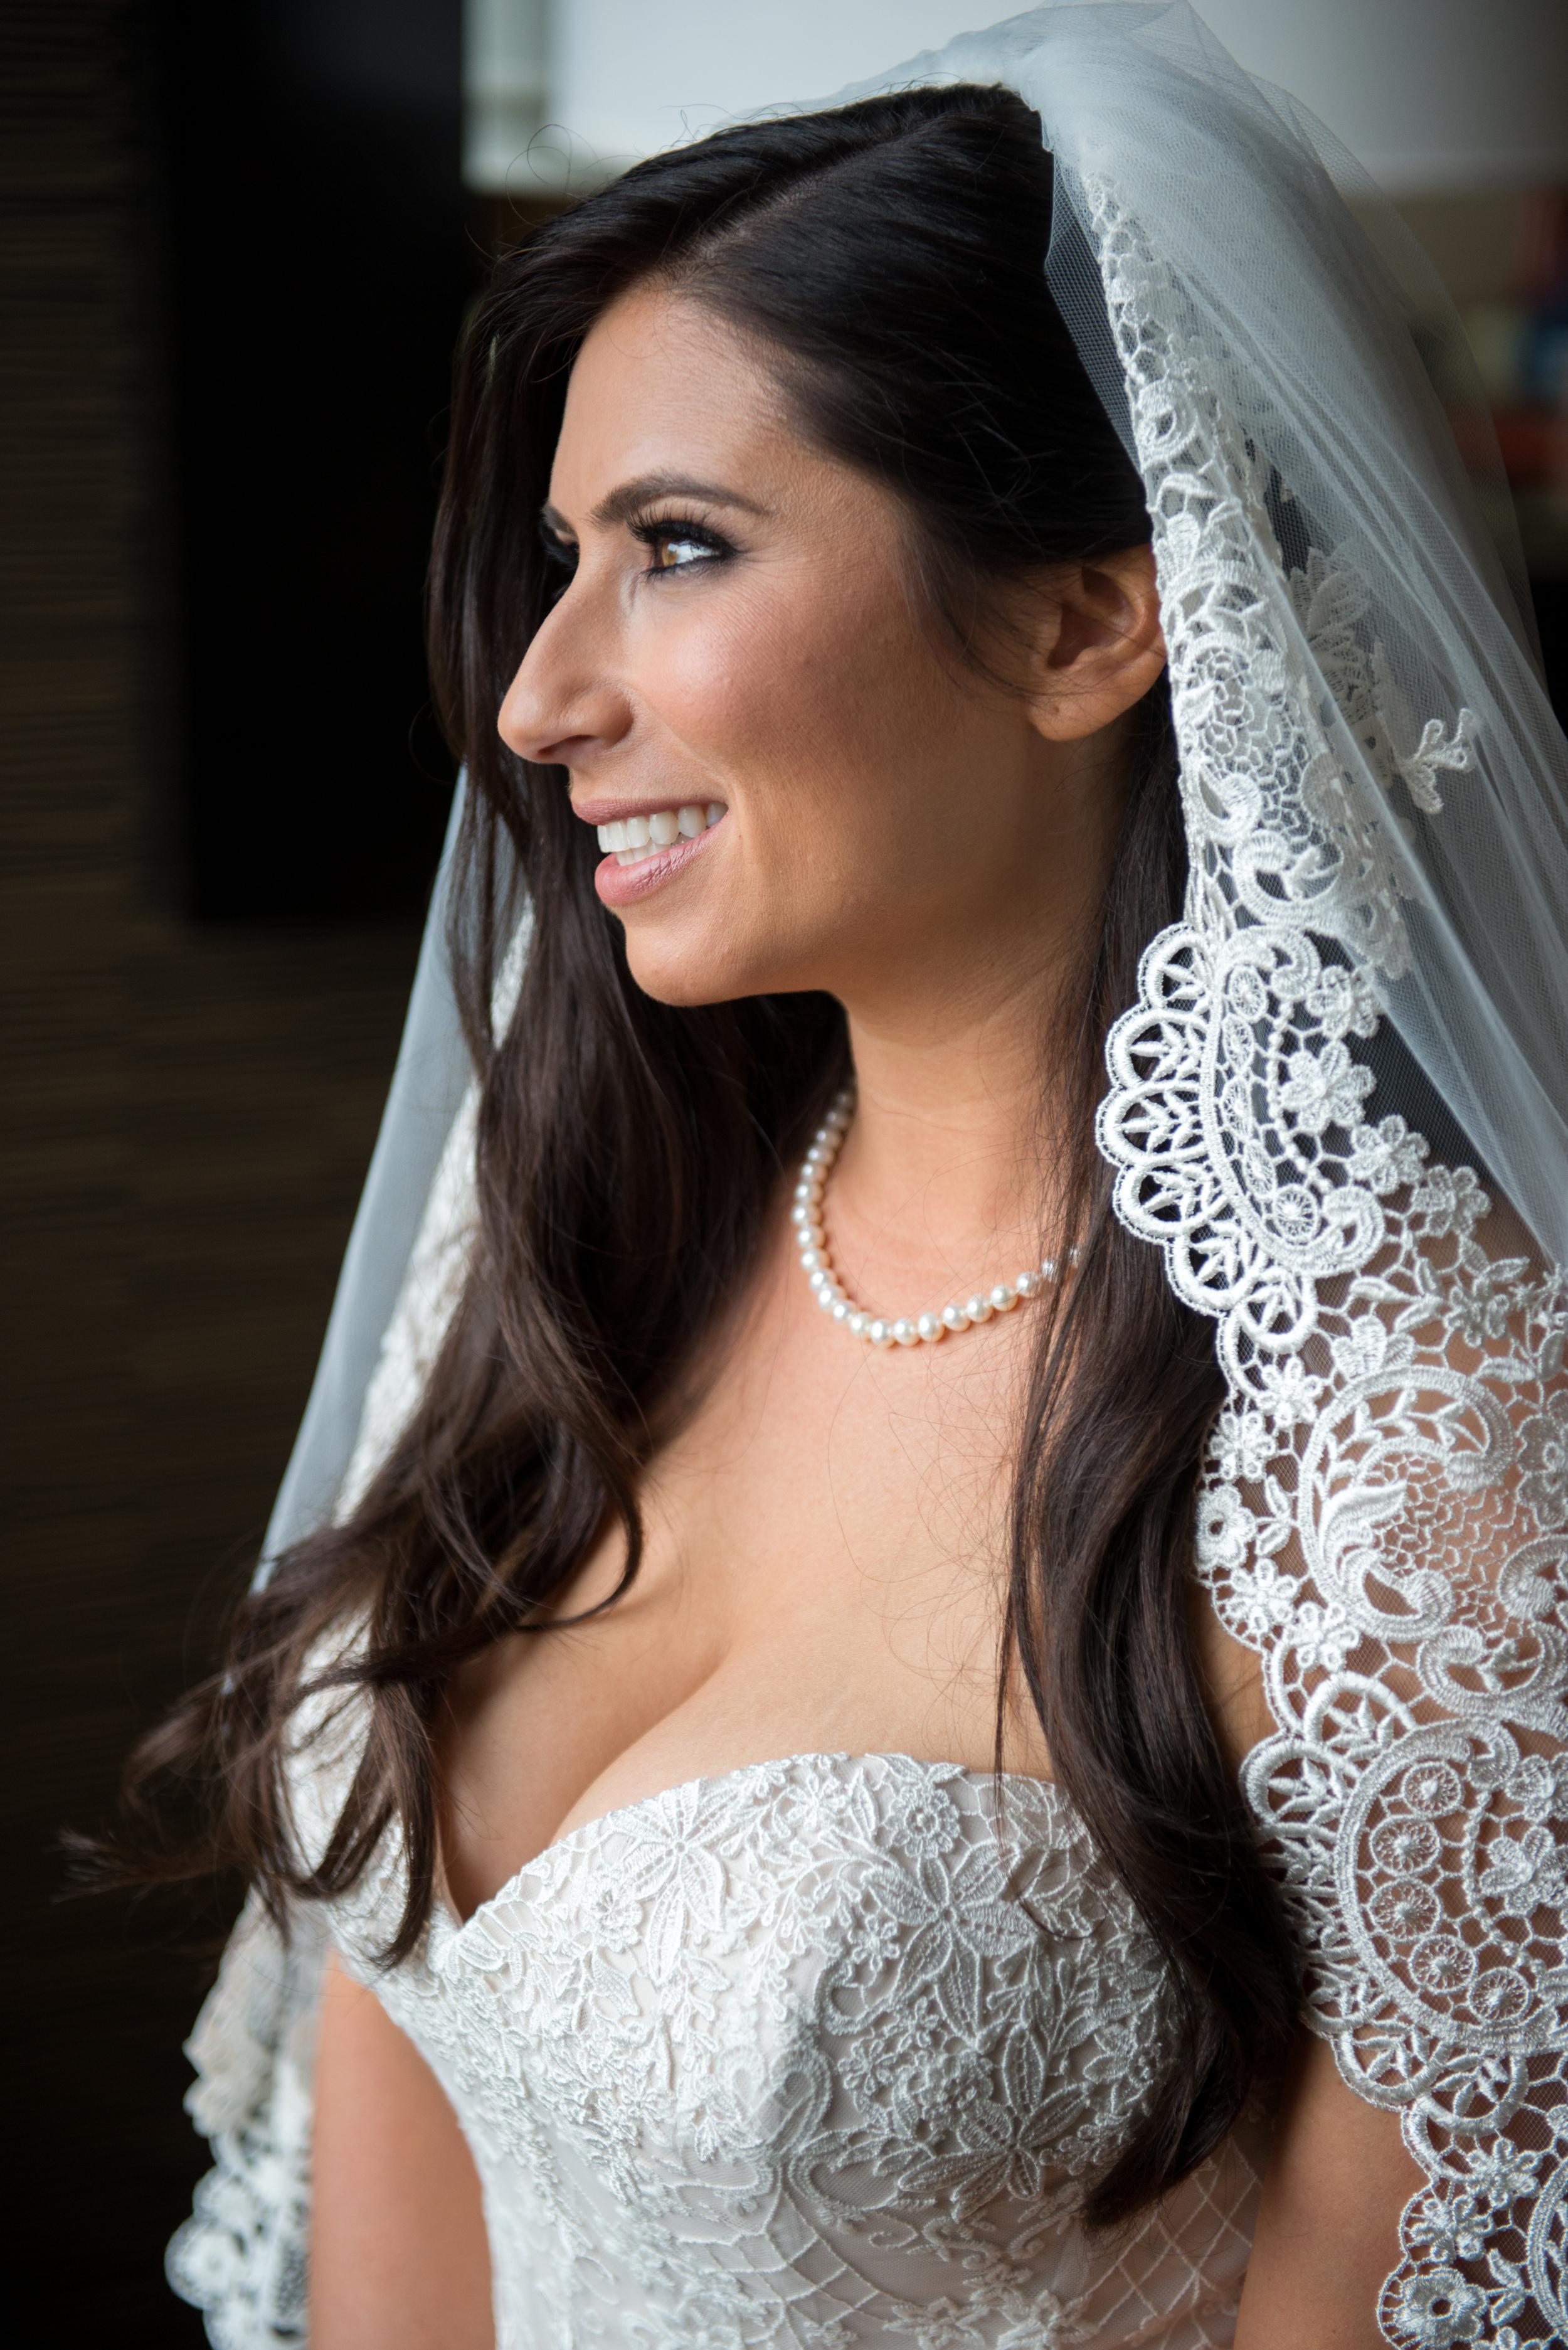 Acowsay_Cinema_MN_Wedding_Bride_2.jpg